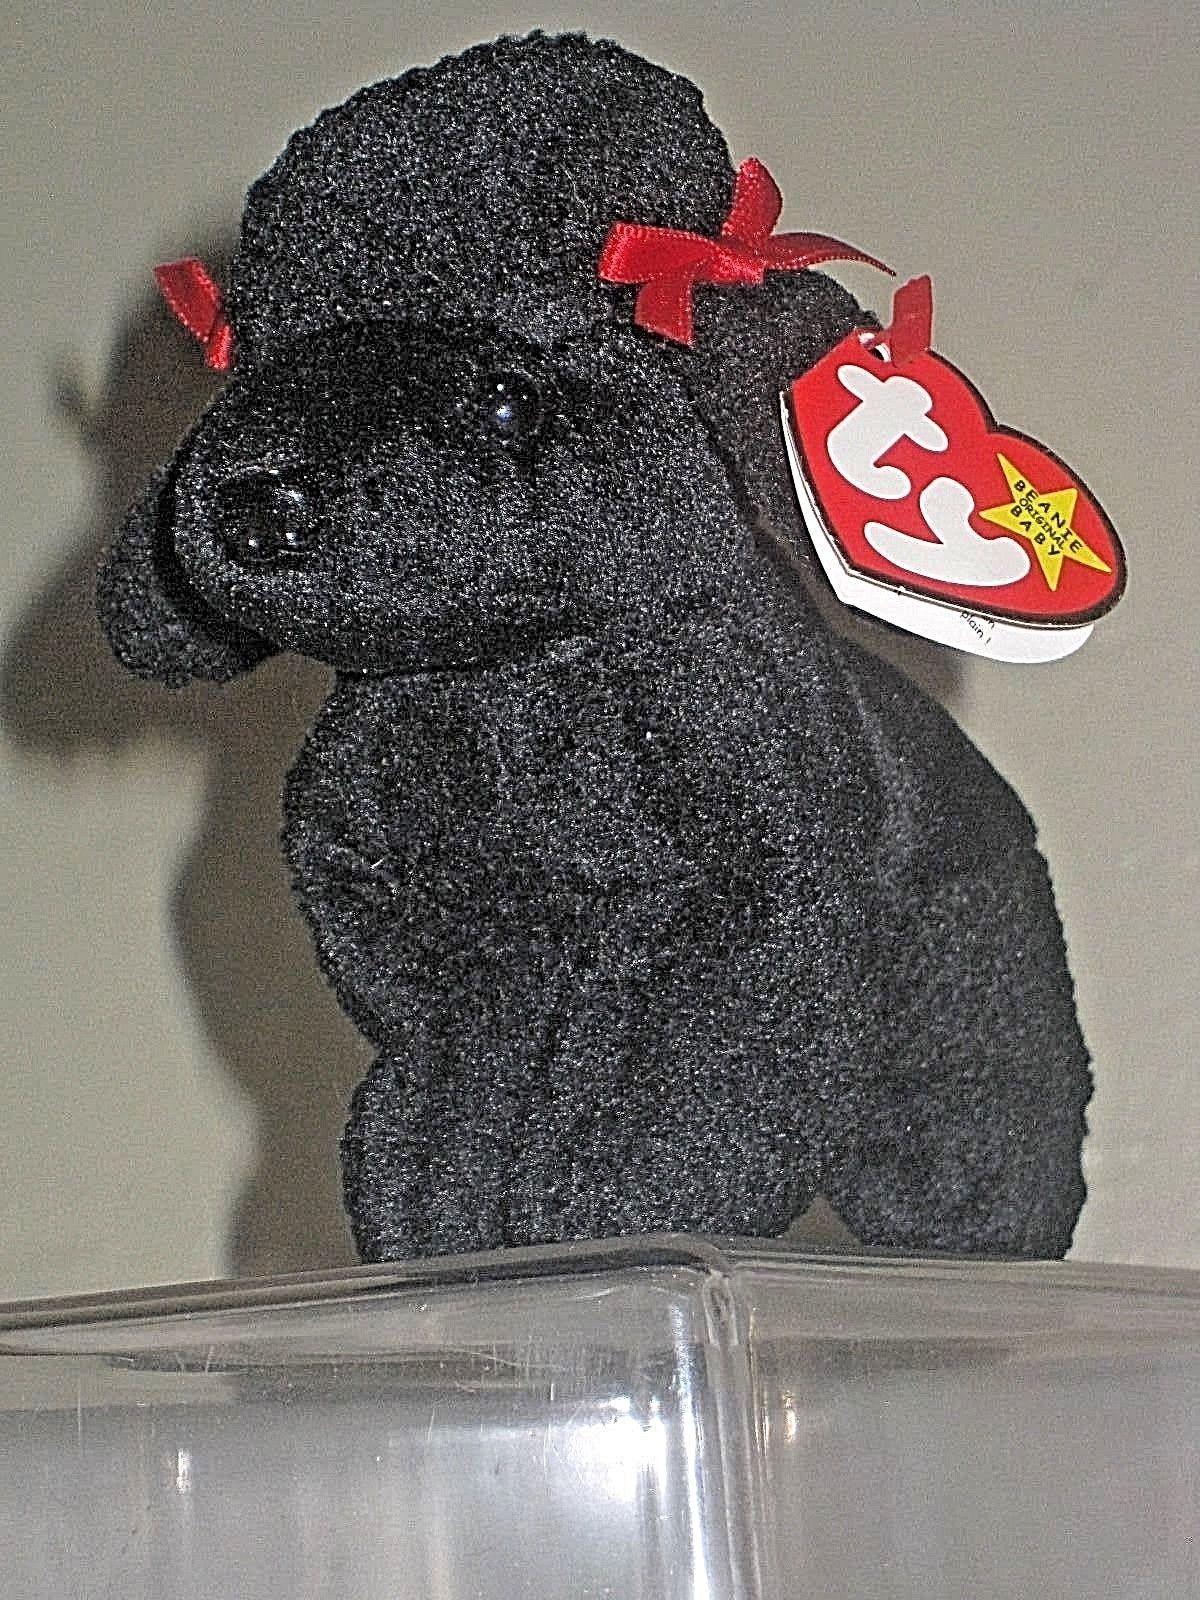 c95b8e9bae6 Ty Beanie Baby Gigi Poodle Dog Errors Tag Retired 1997   1998 ...